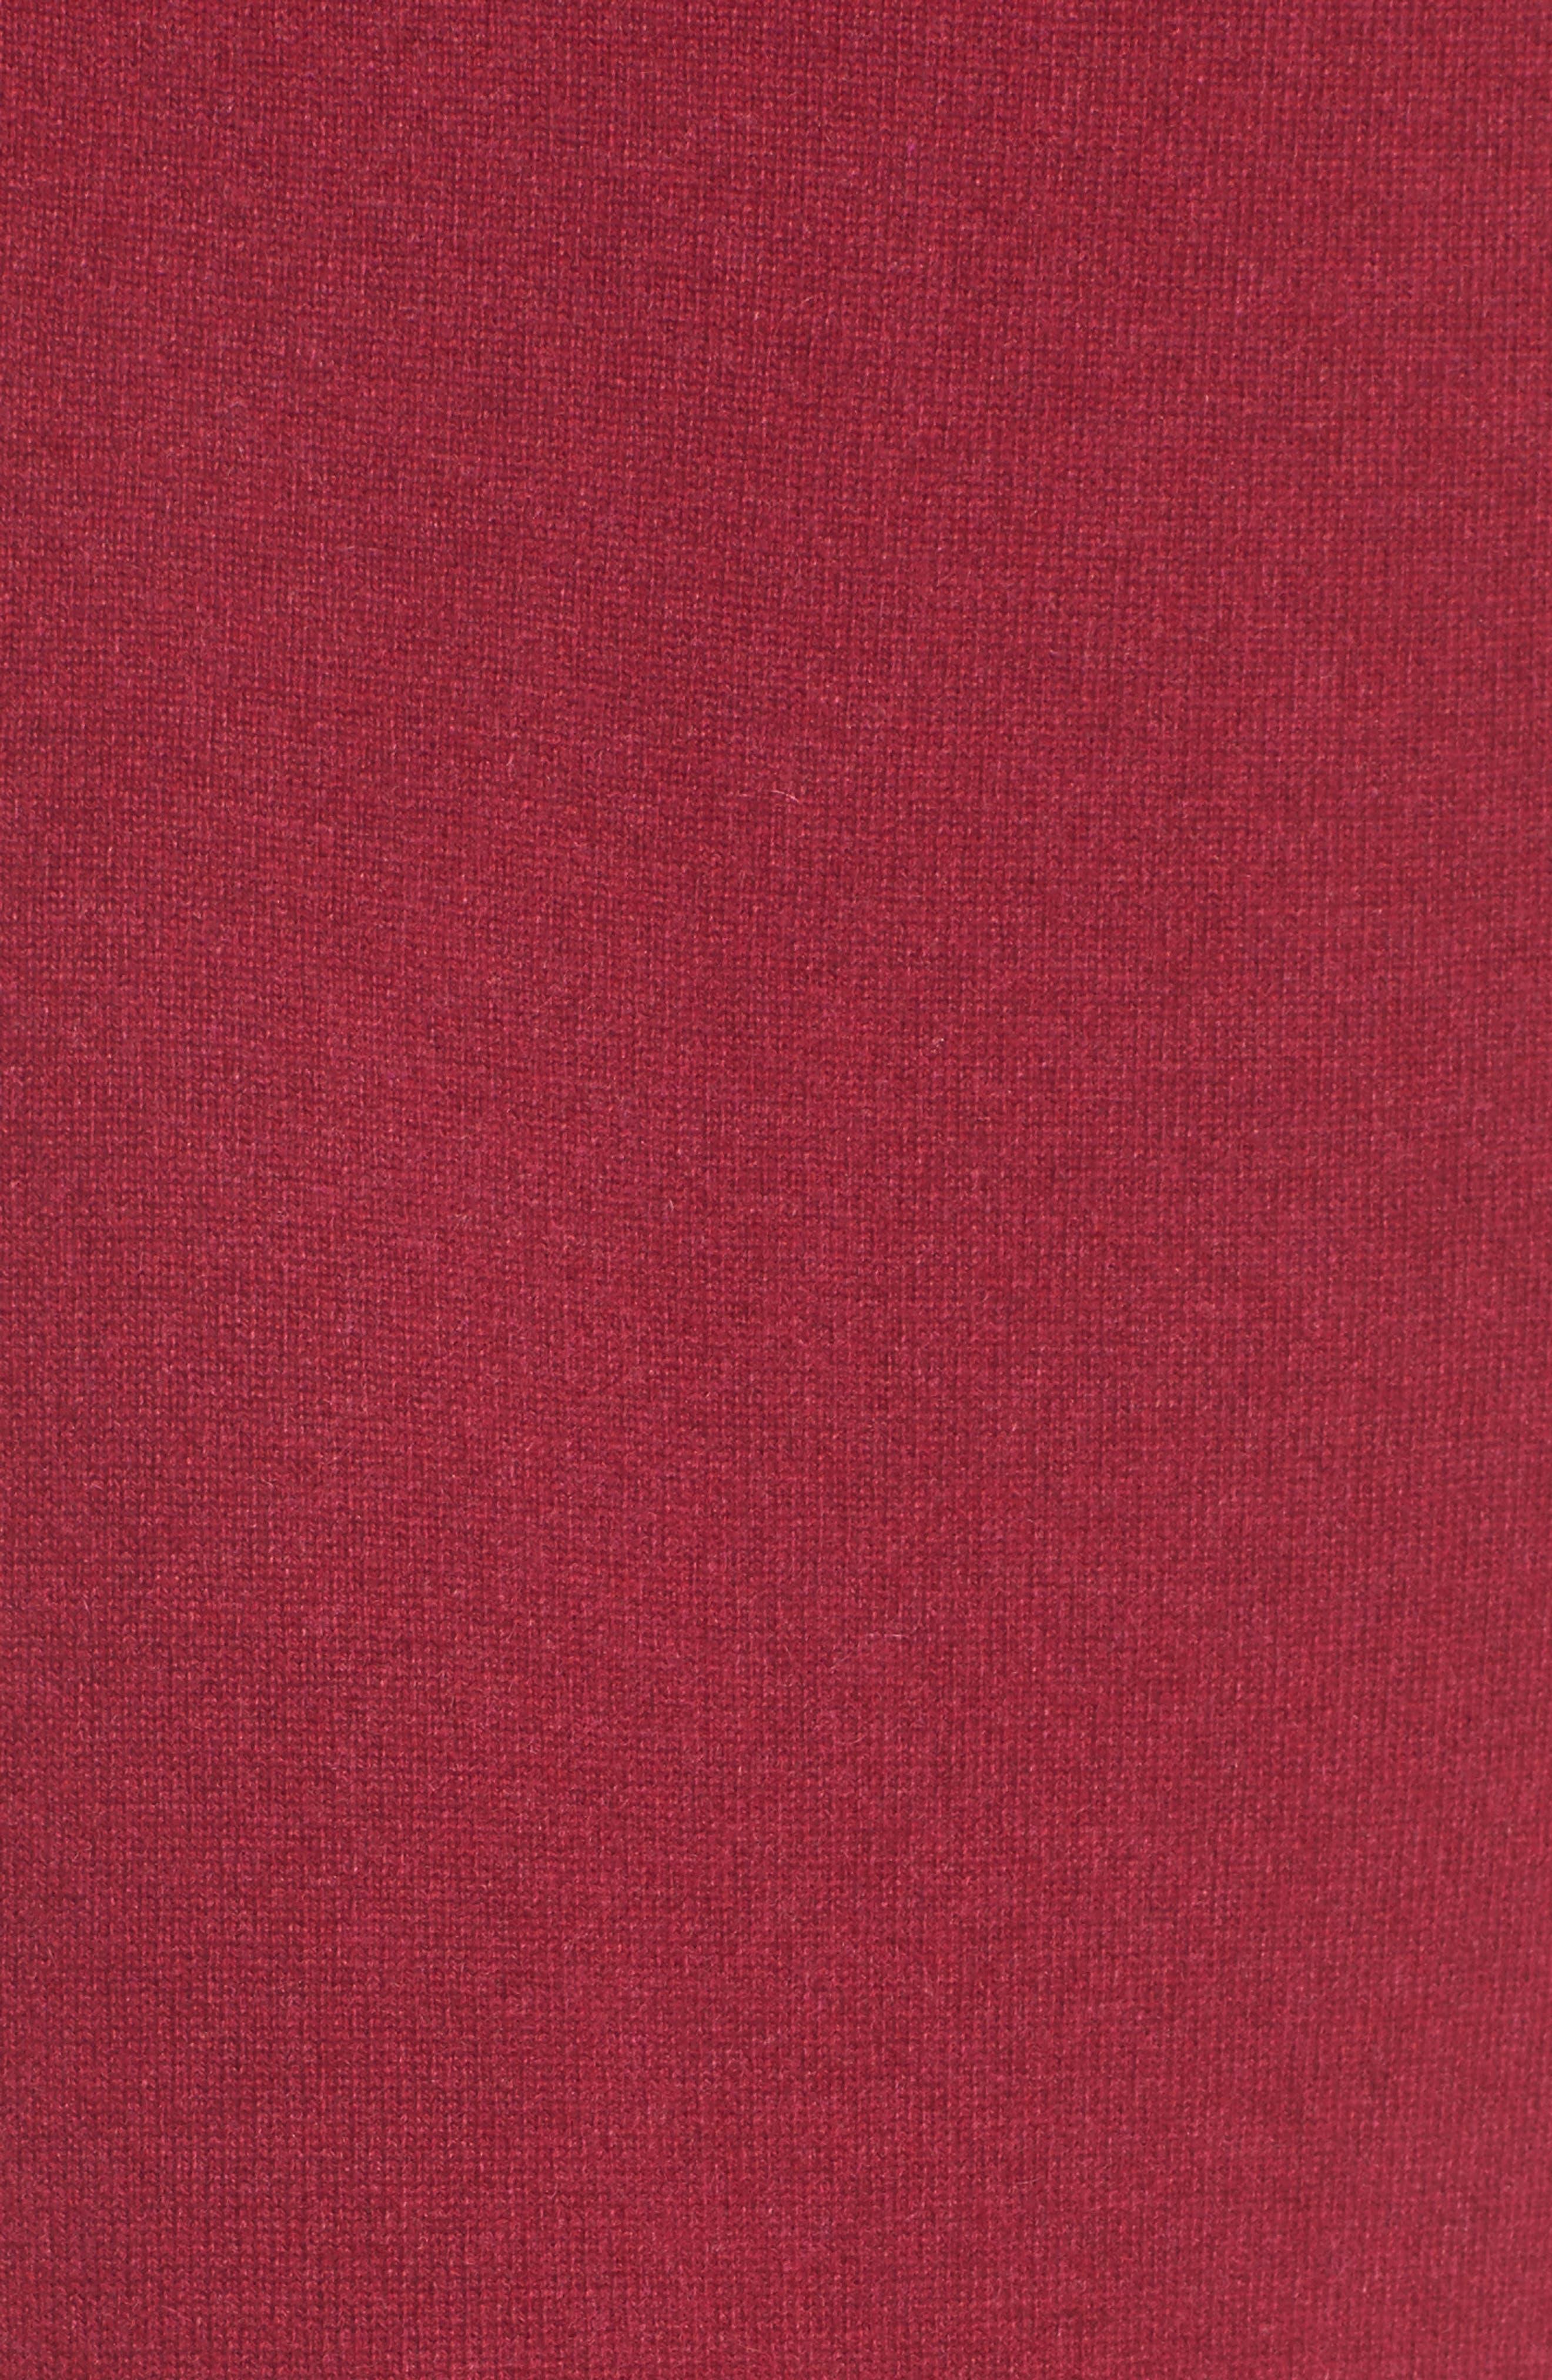 Cashmere Knit Pencil Skirt,                             Alternate thumbnail 5, color,                             Hibiscus